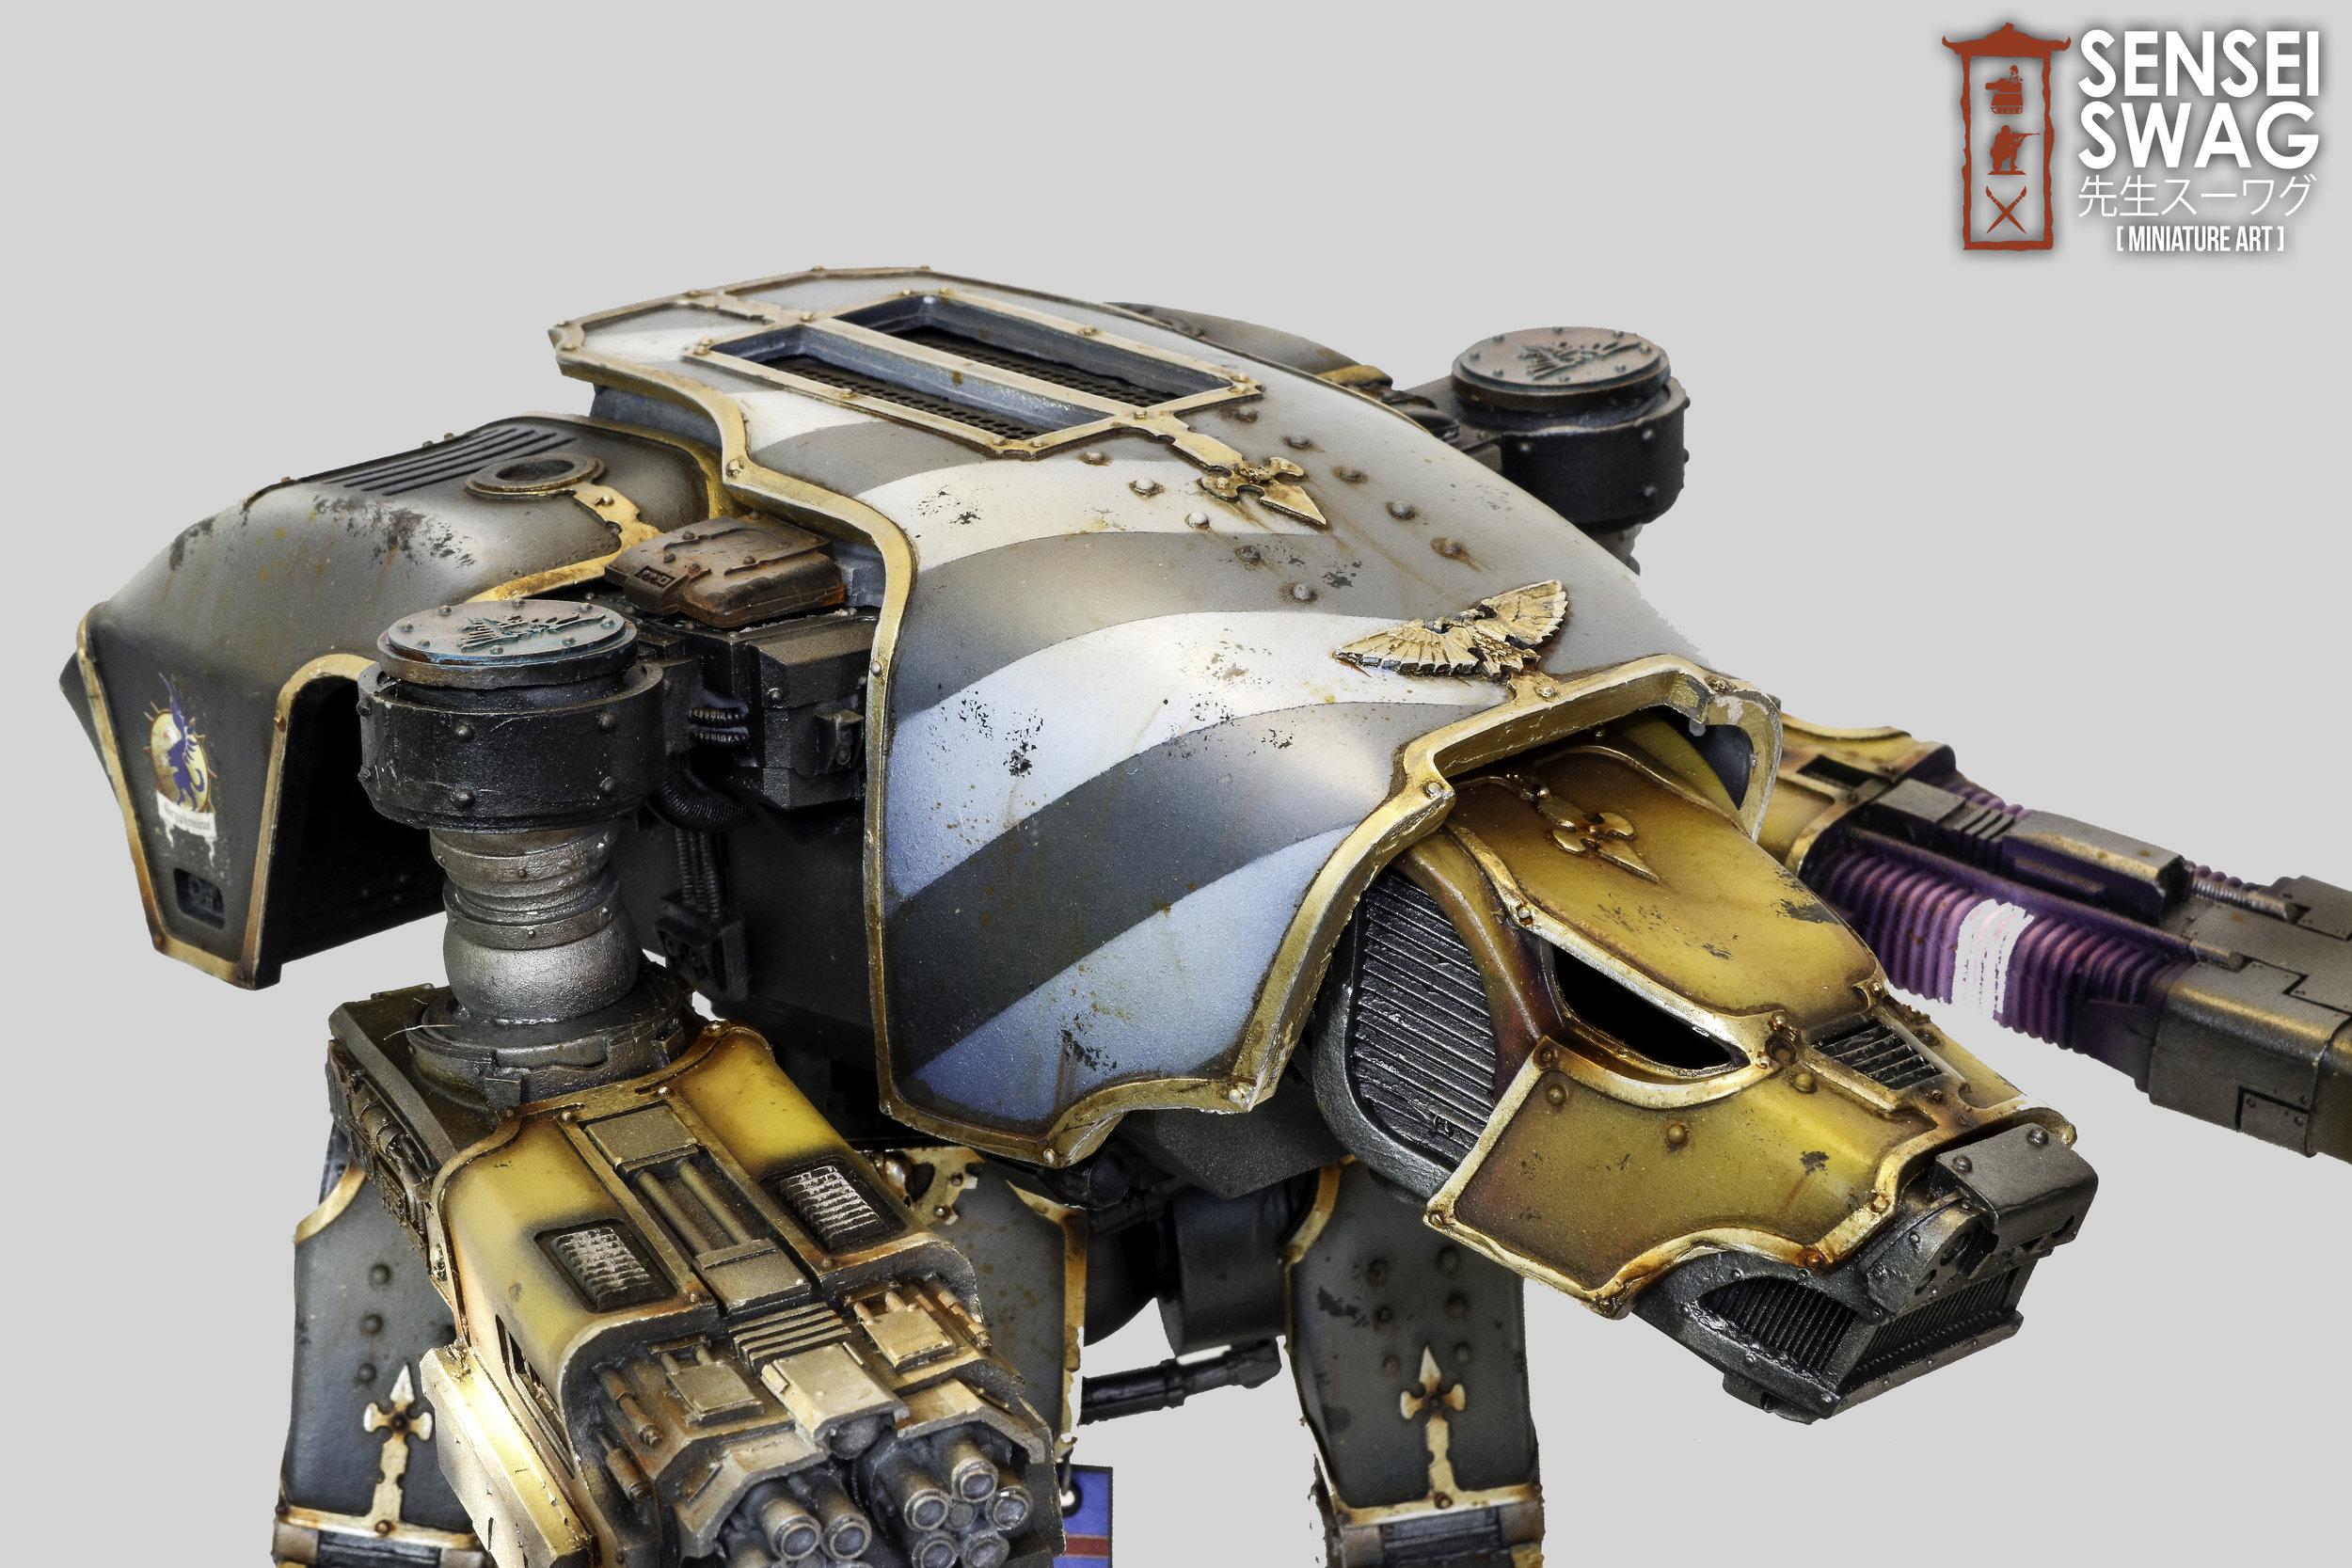 Watermark Legio Gryphonicus Titans Weathered Reaver Warhound-6.jpg